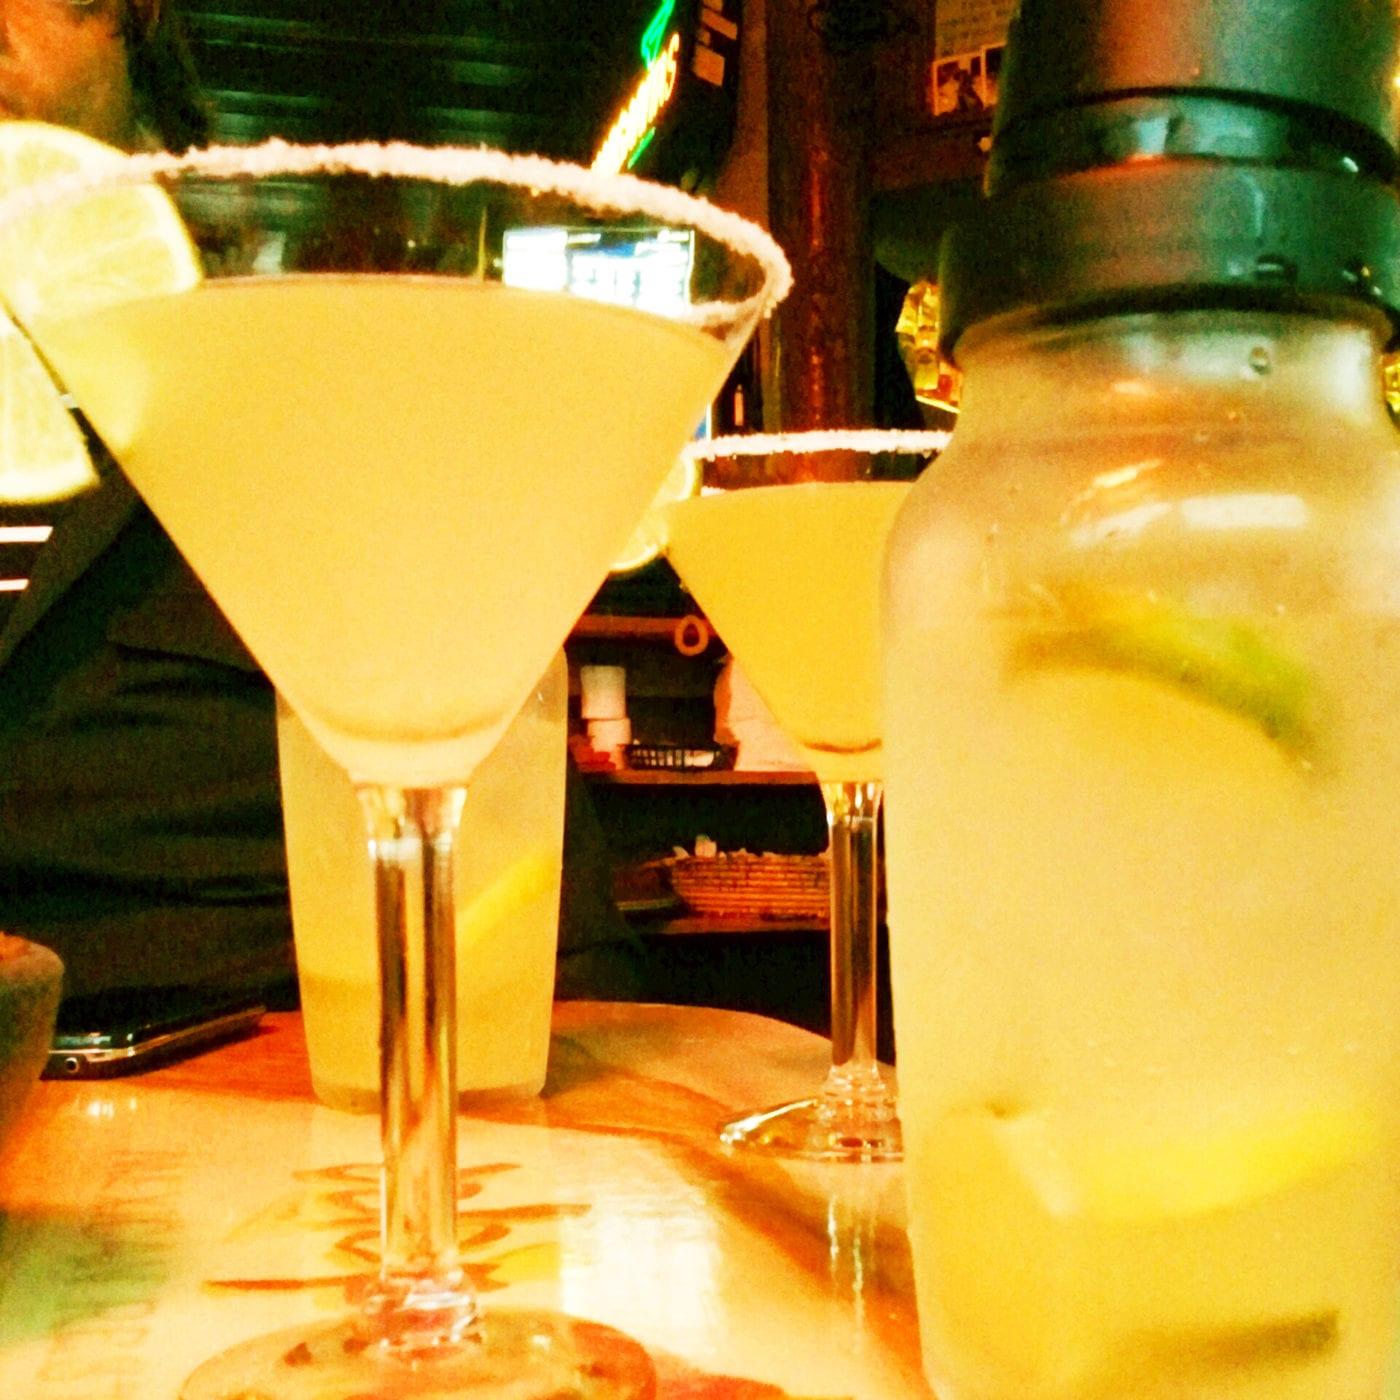 Tequila, Whatcom County spirits, Jalapenos, Bellingham, Margaritas, Tequila Bar, Bellingham's Best Mexican food